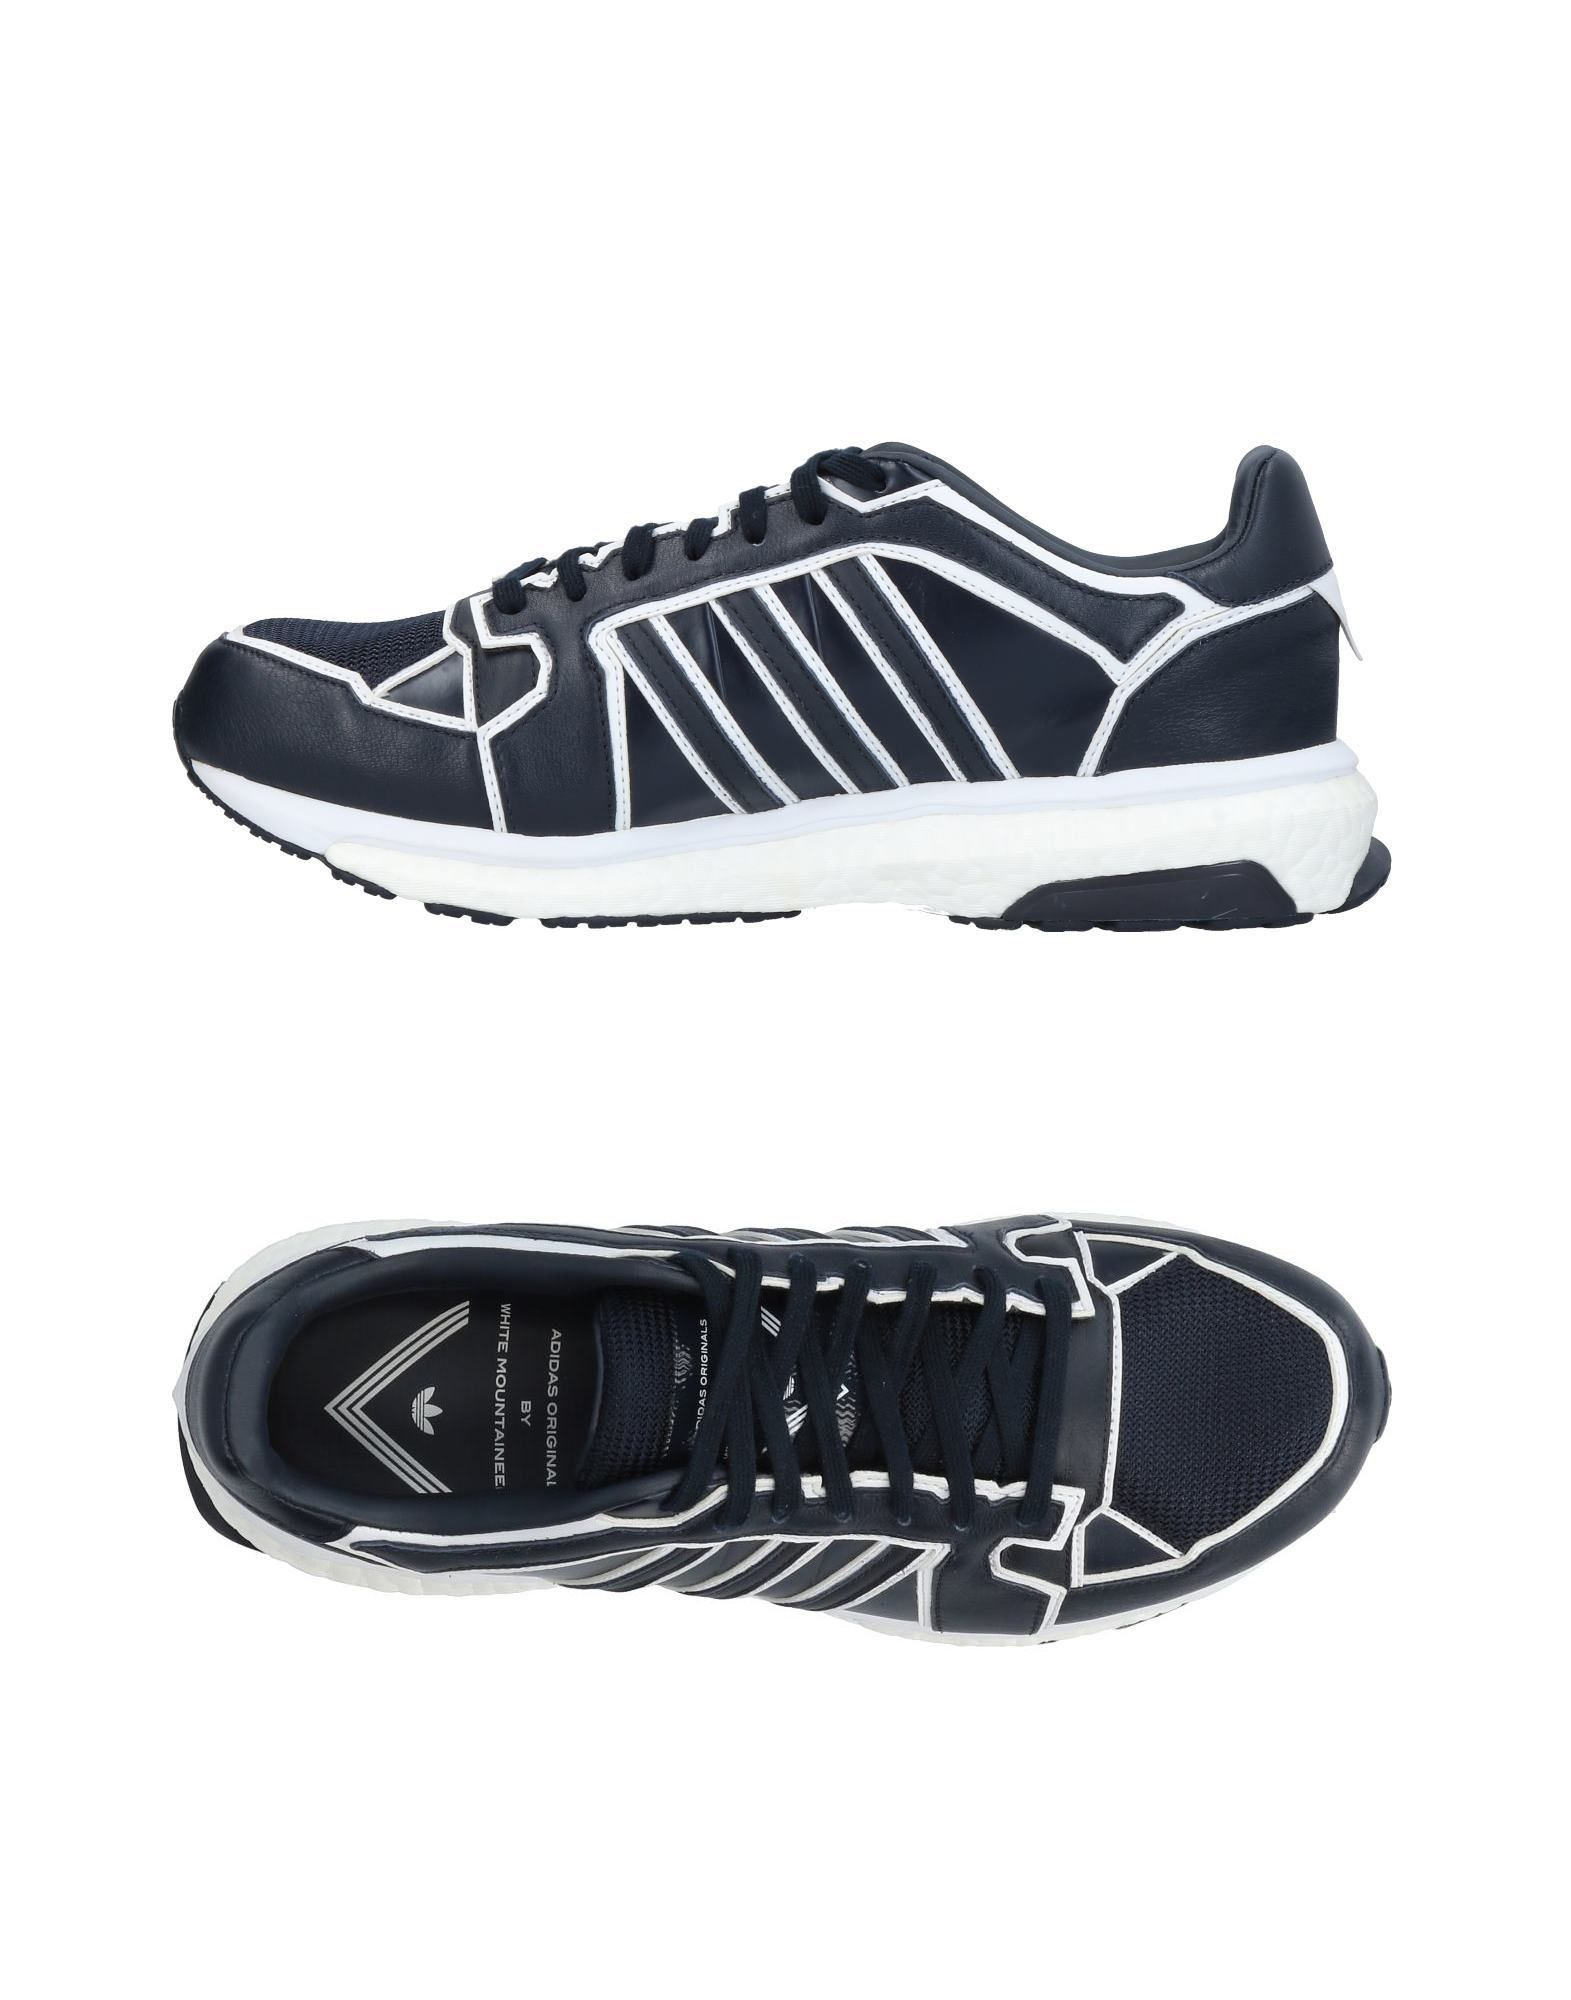 Sneakers Adidas Originals By White Mountaineering Uomo - Acquista online su